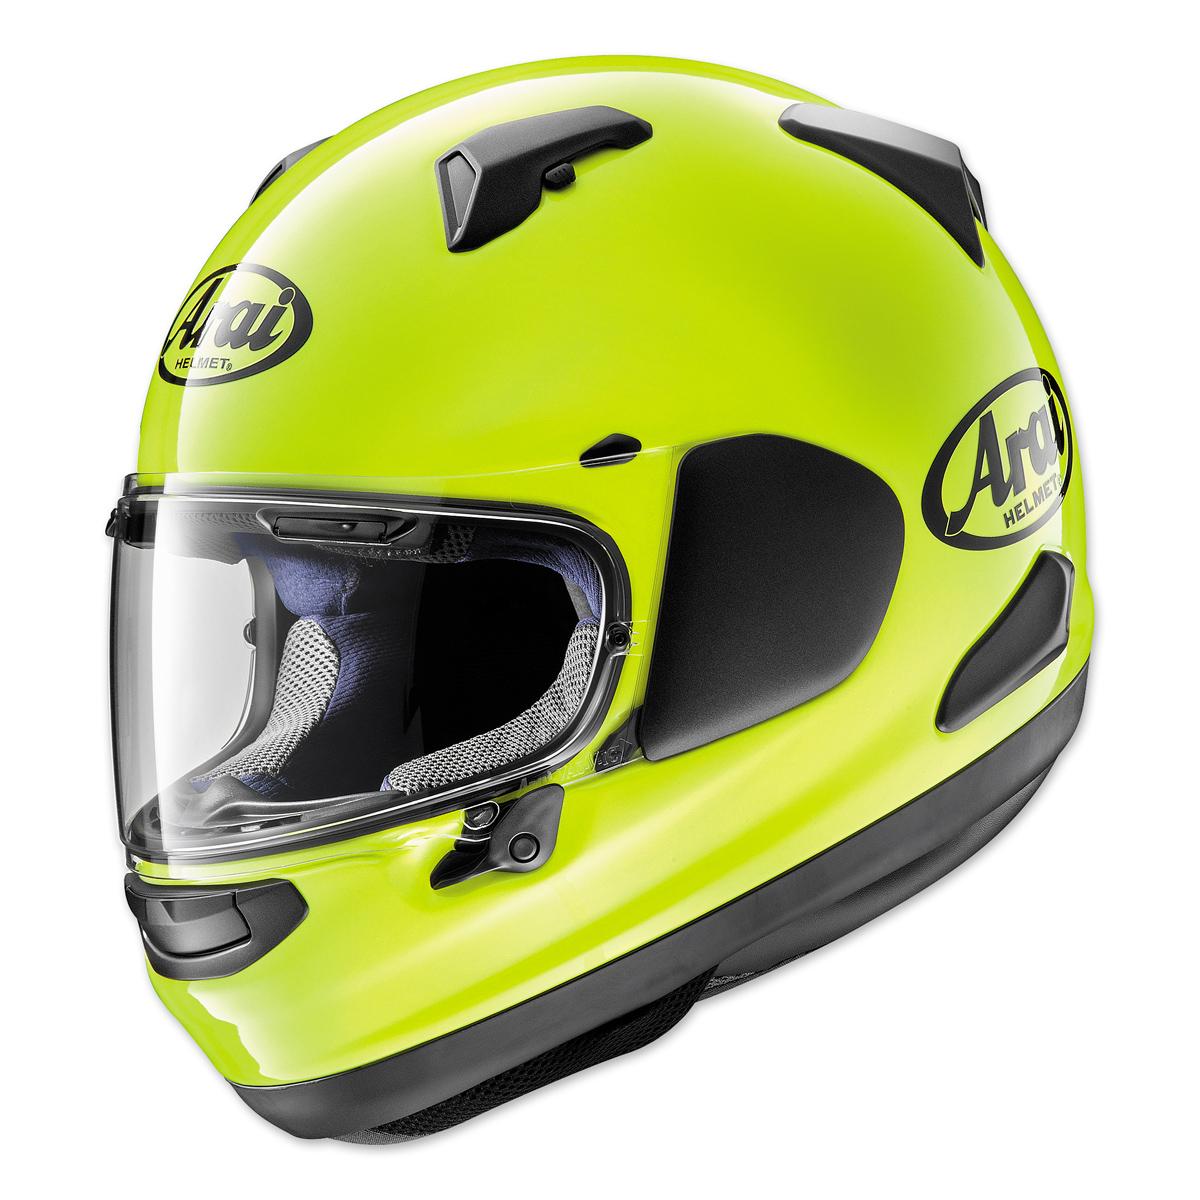 Arai Signet-X Fluorescent Yellow Full Face Helmet